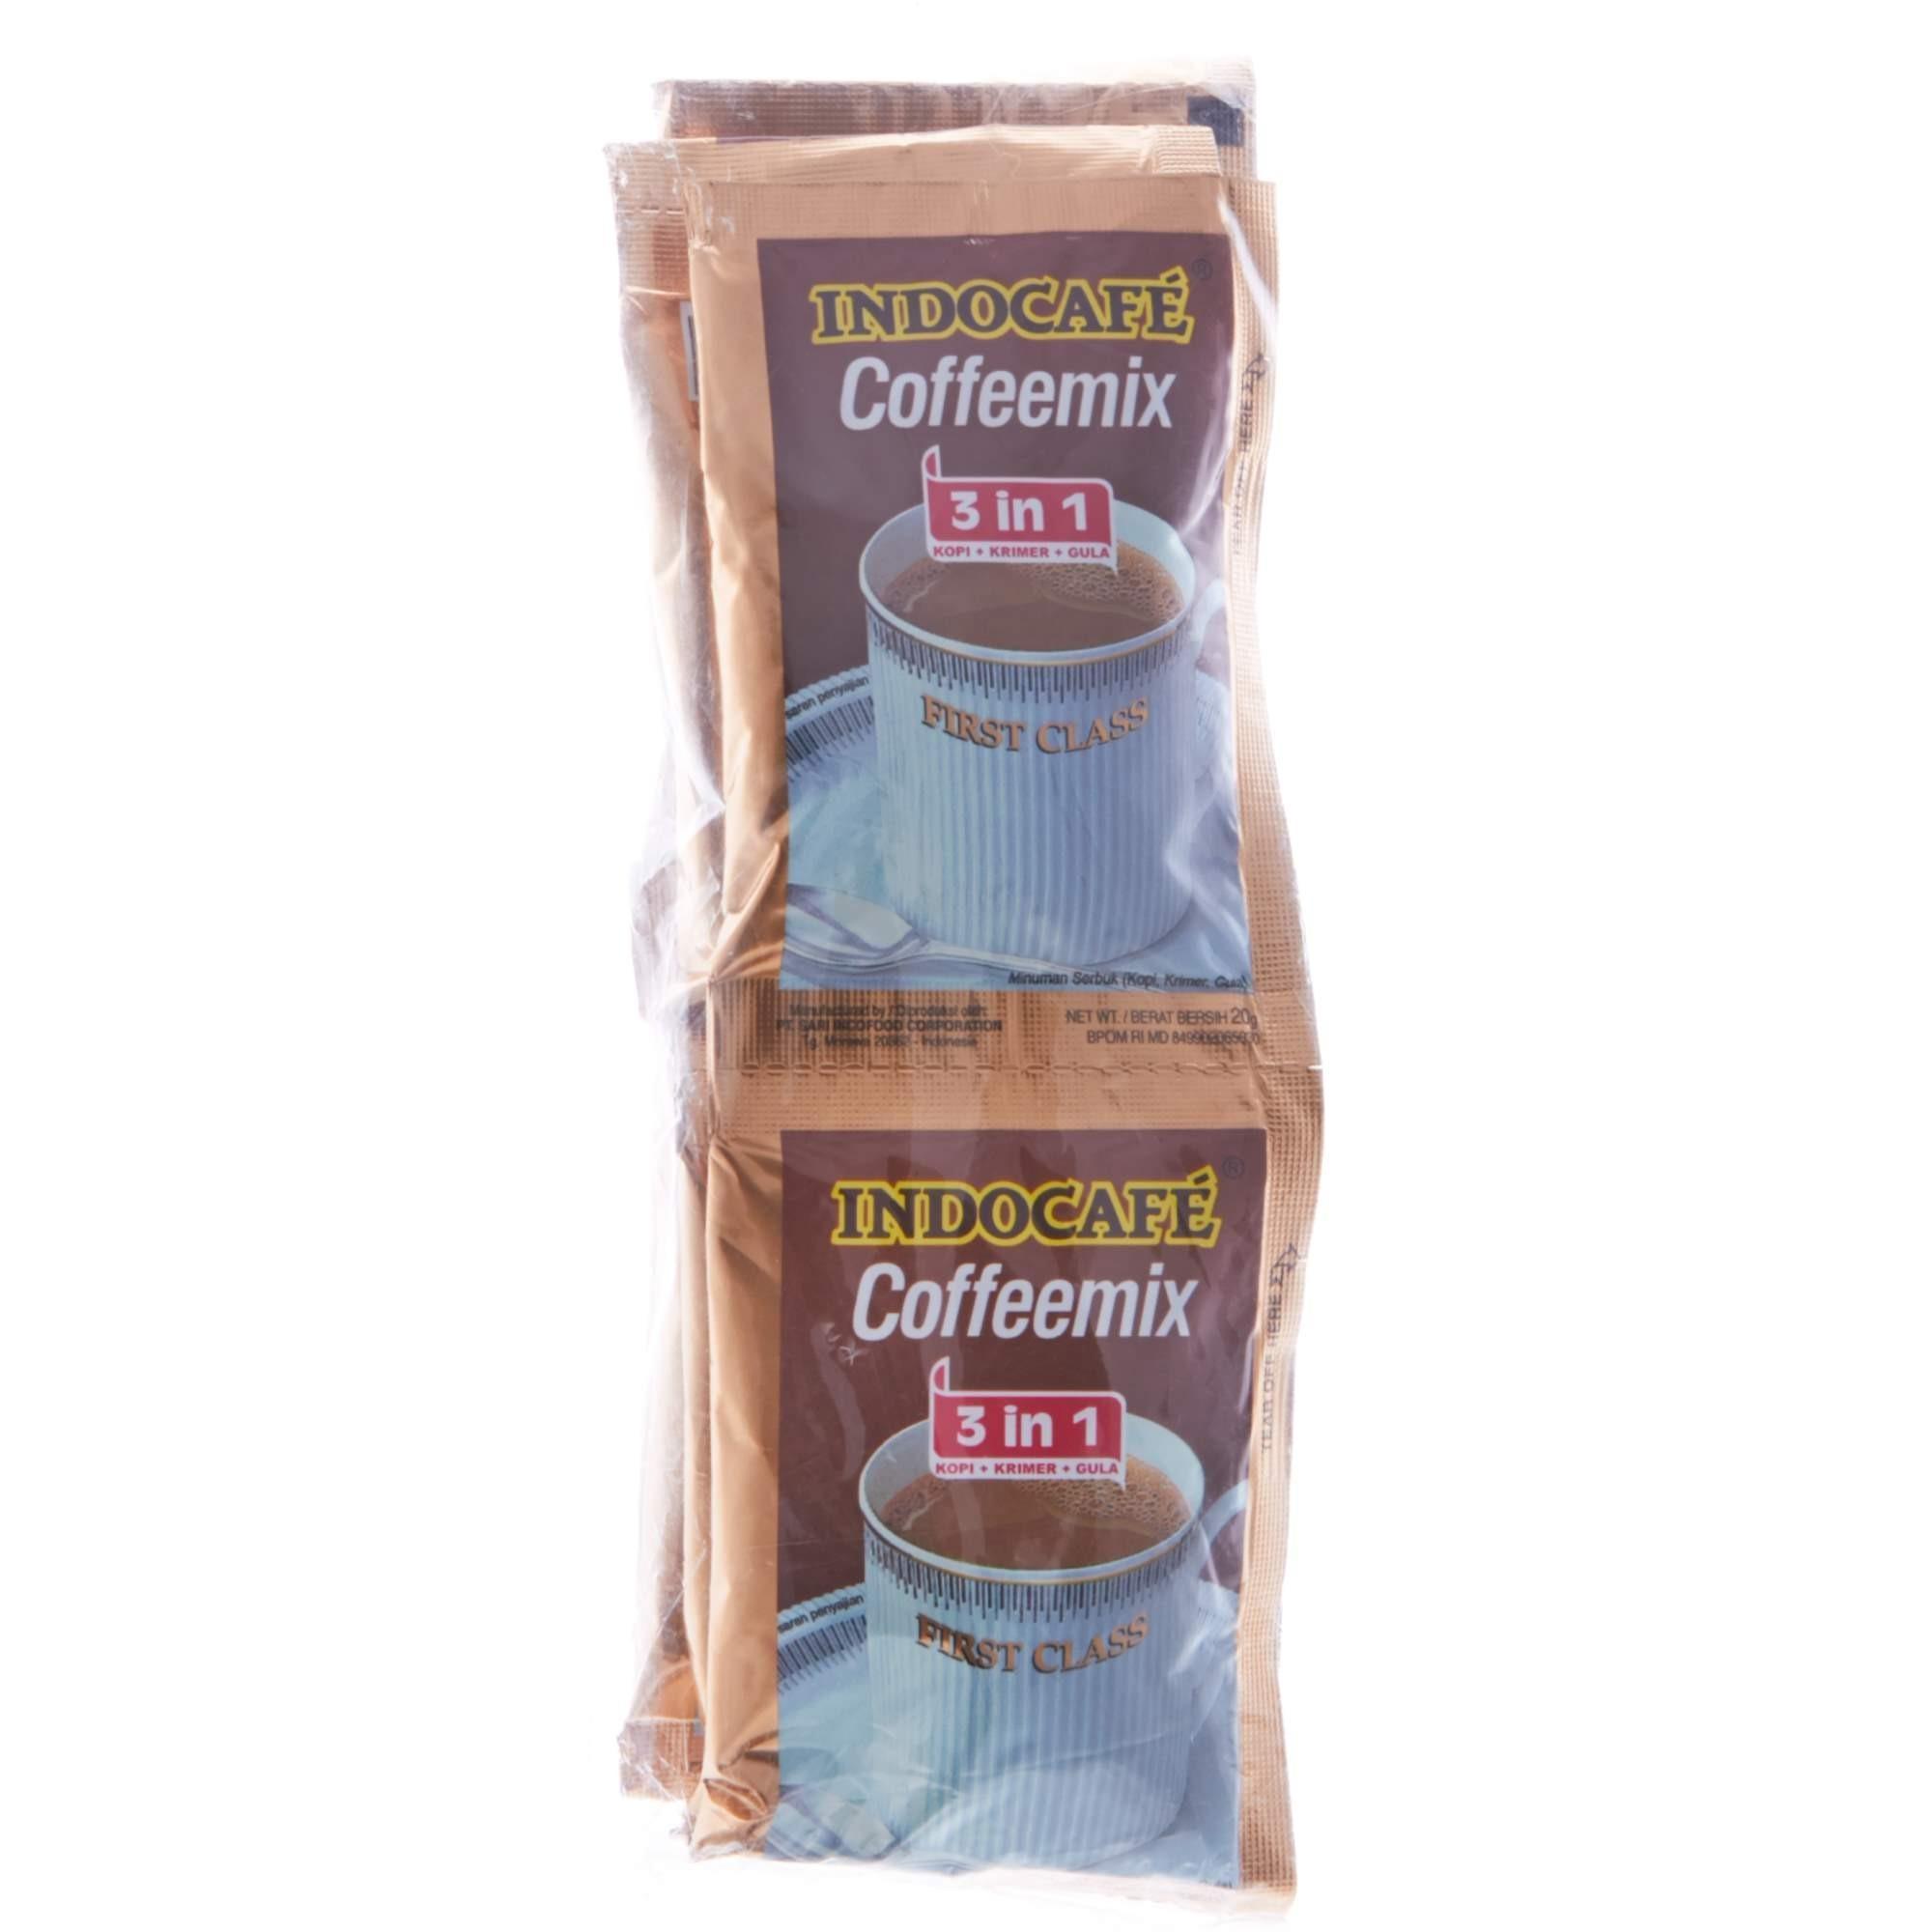 Toko Indonesia Perbandingan Harga Minuman Kopi 13 08 18 Biji Bubuk Jantan Warung Tinggi Premium Blended Coffee 1 Kg Img